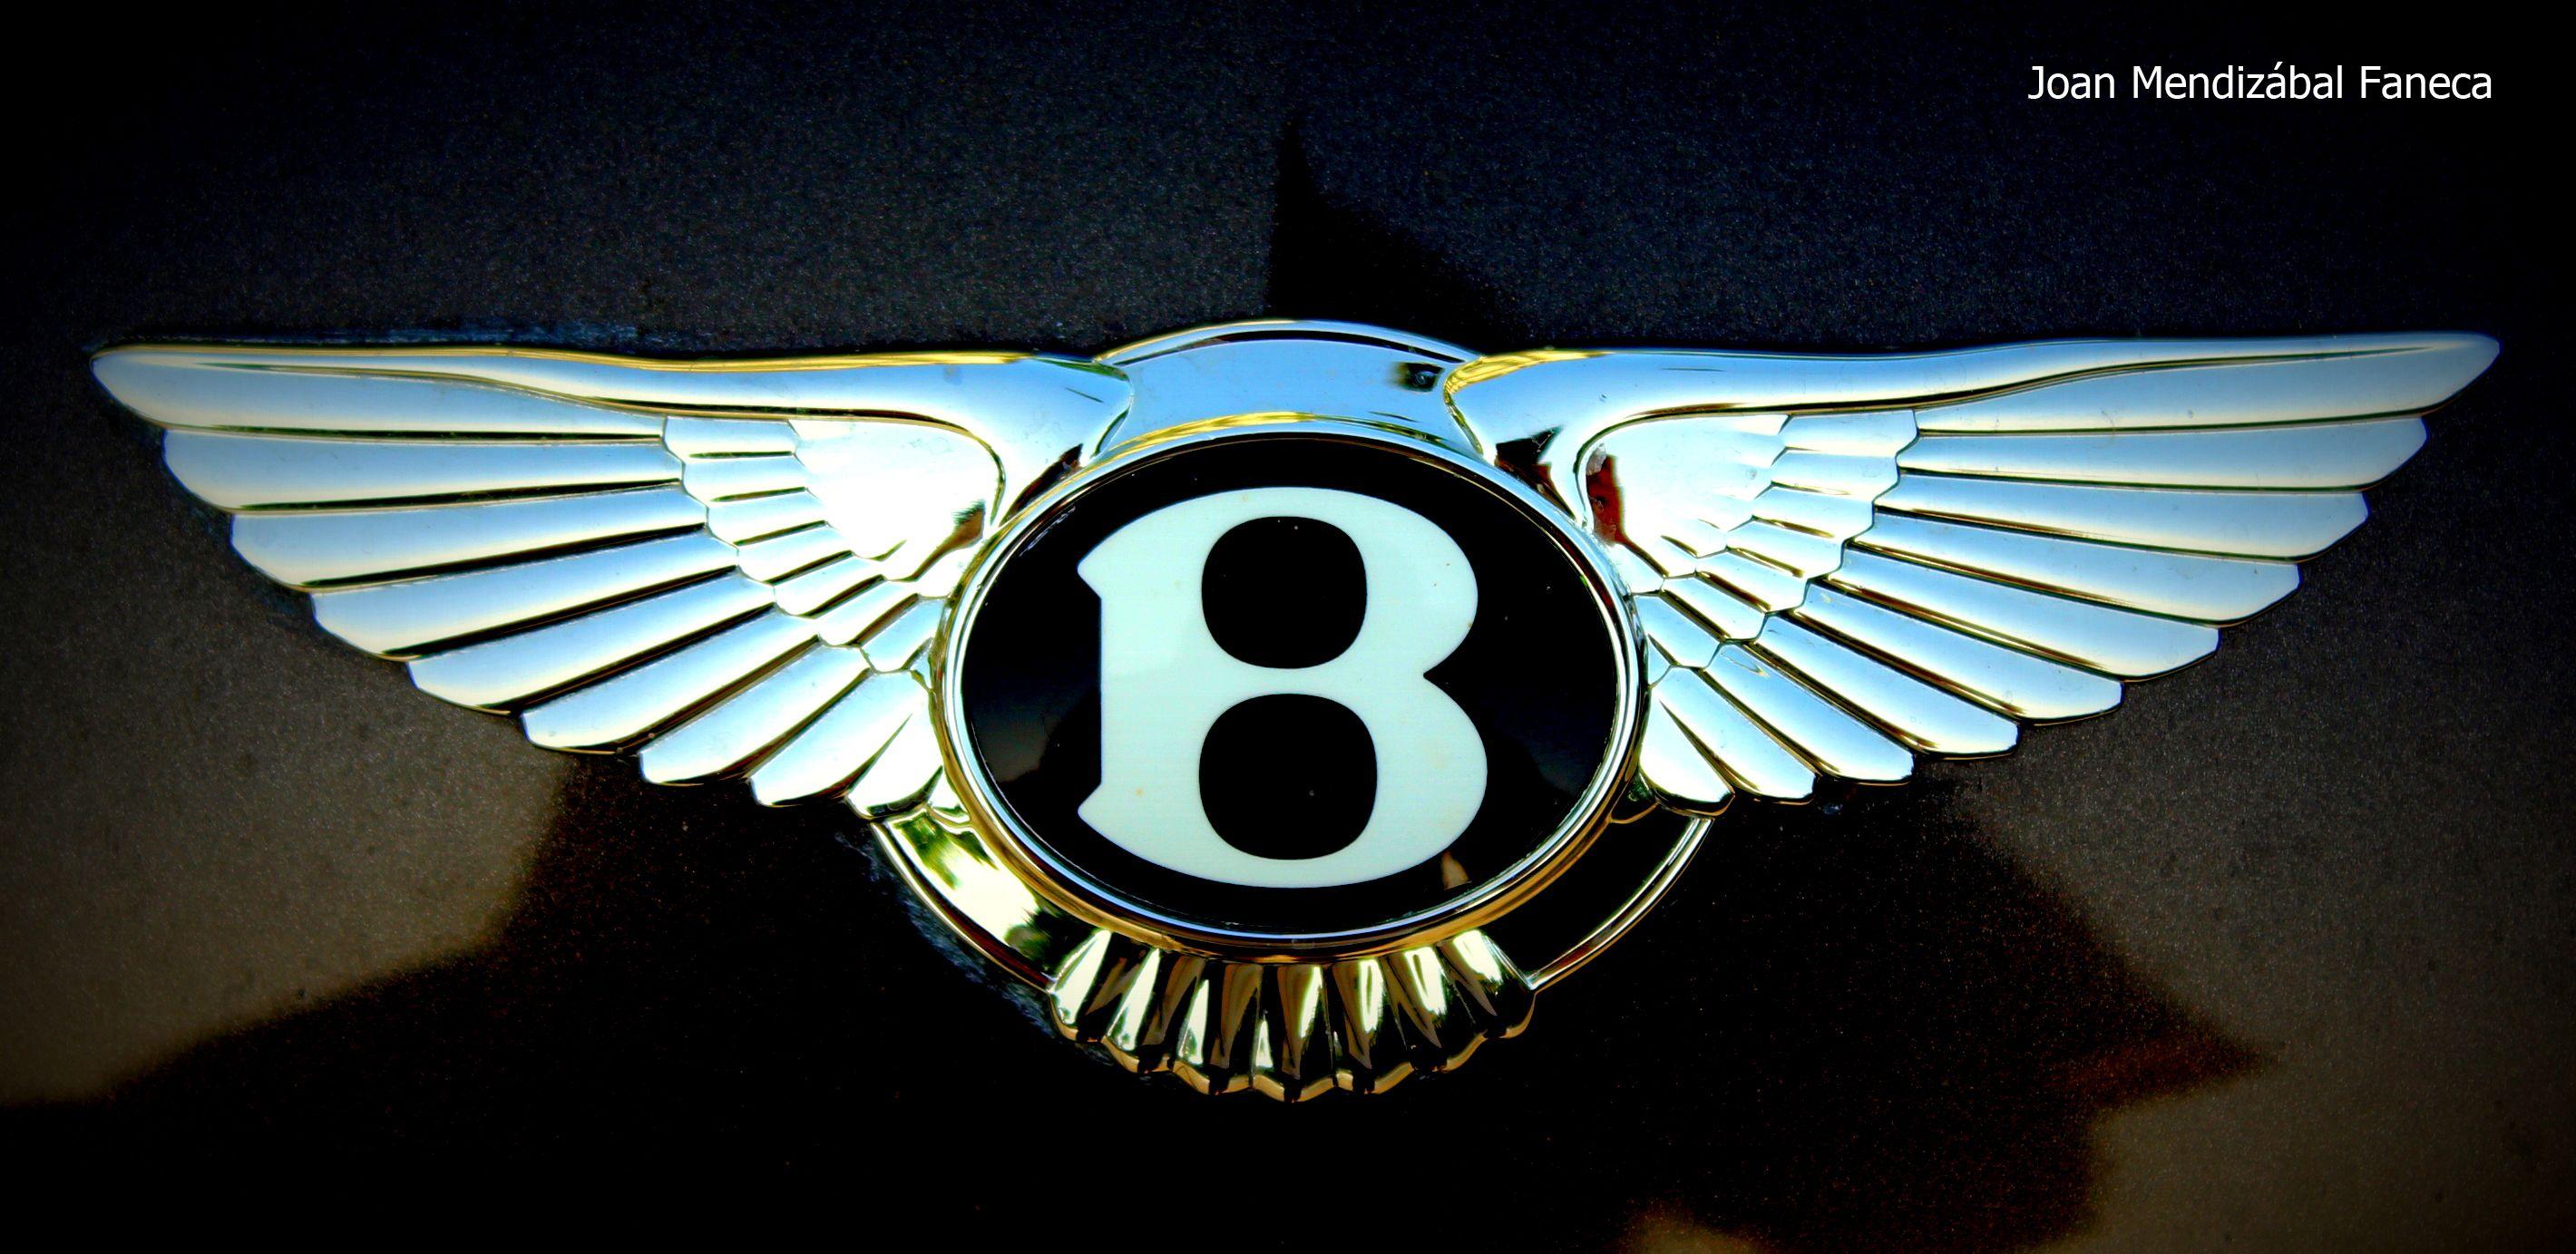 bently logo | Bentley Logo wallpaper by Jonijoni93 on deviantART | B ...